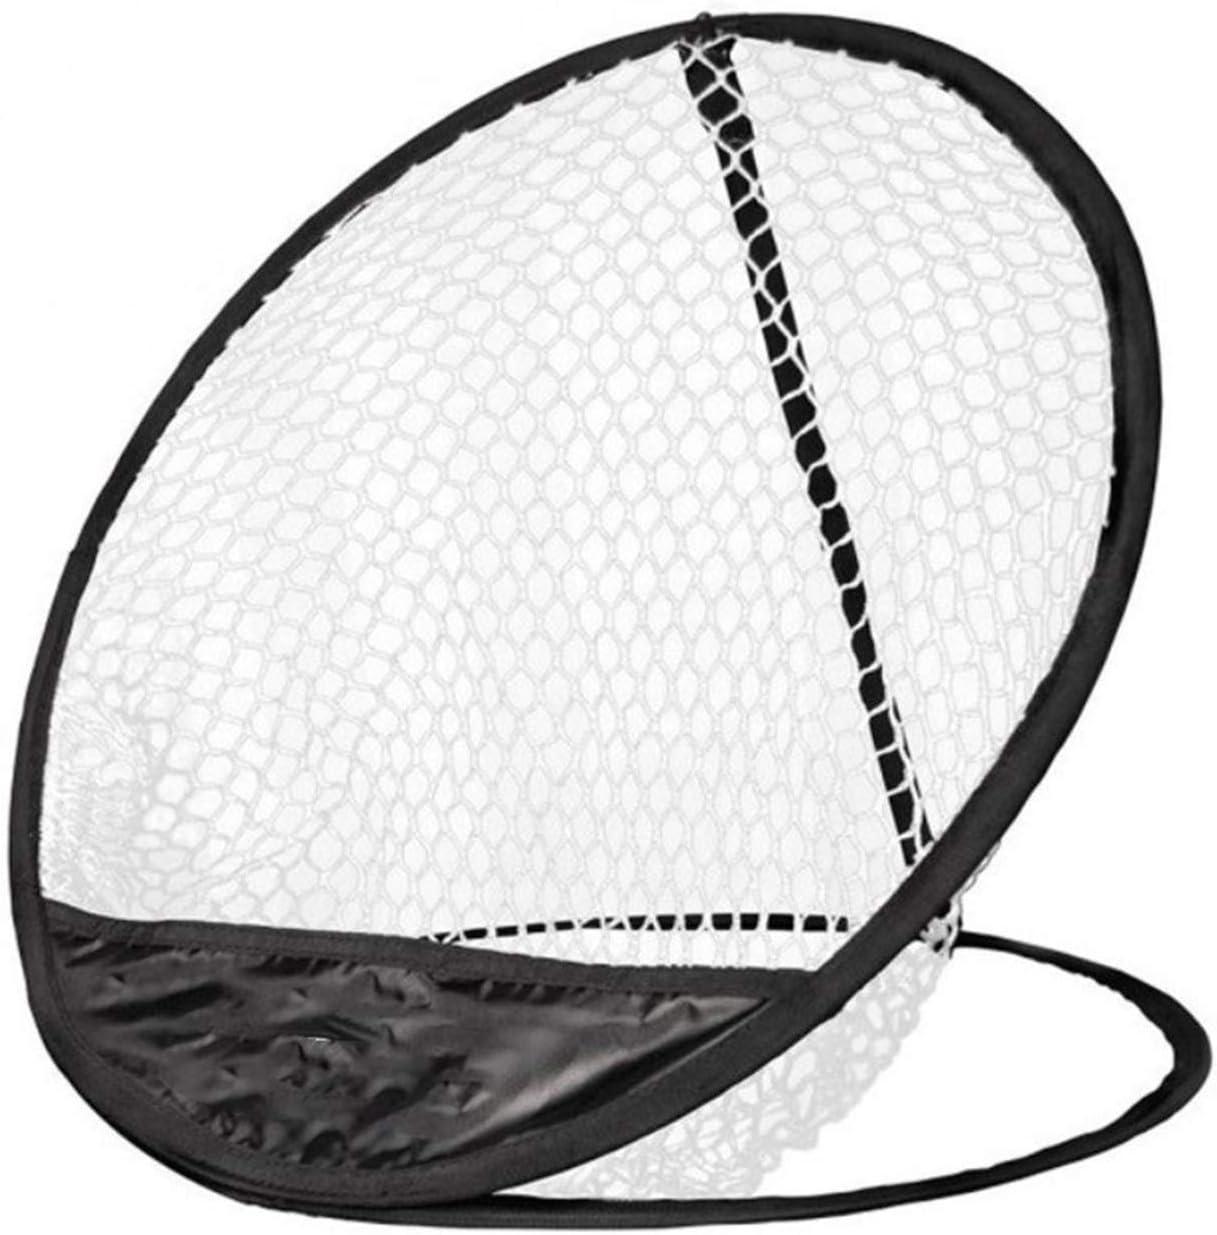 Soporte de guitarra Golf Chipping Training Net Golf Swing Aid para todas las guitarras acústicas Clásico Bajo eléctrico